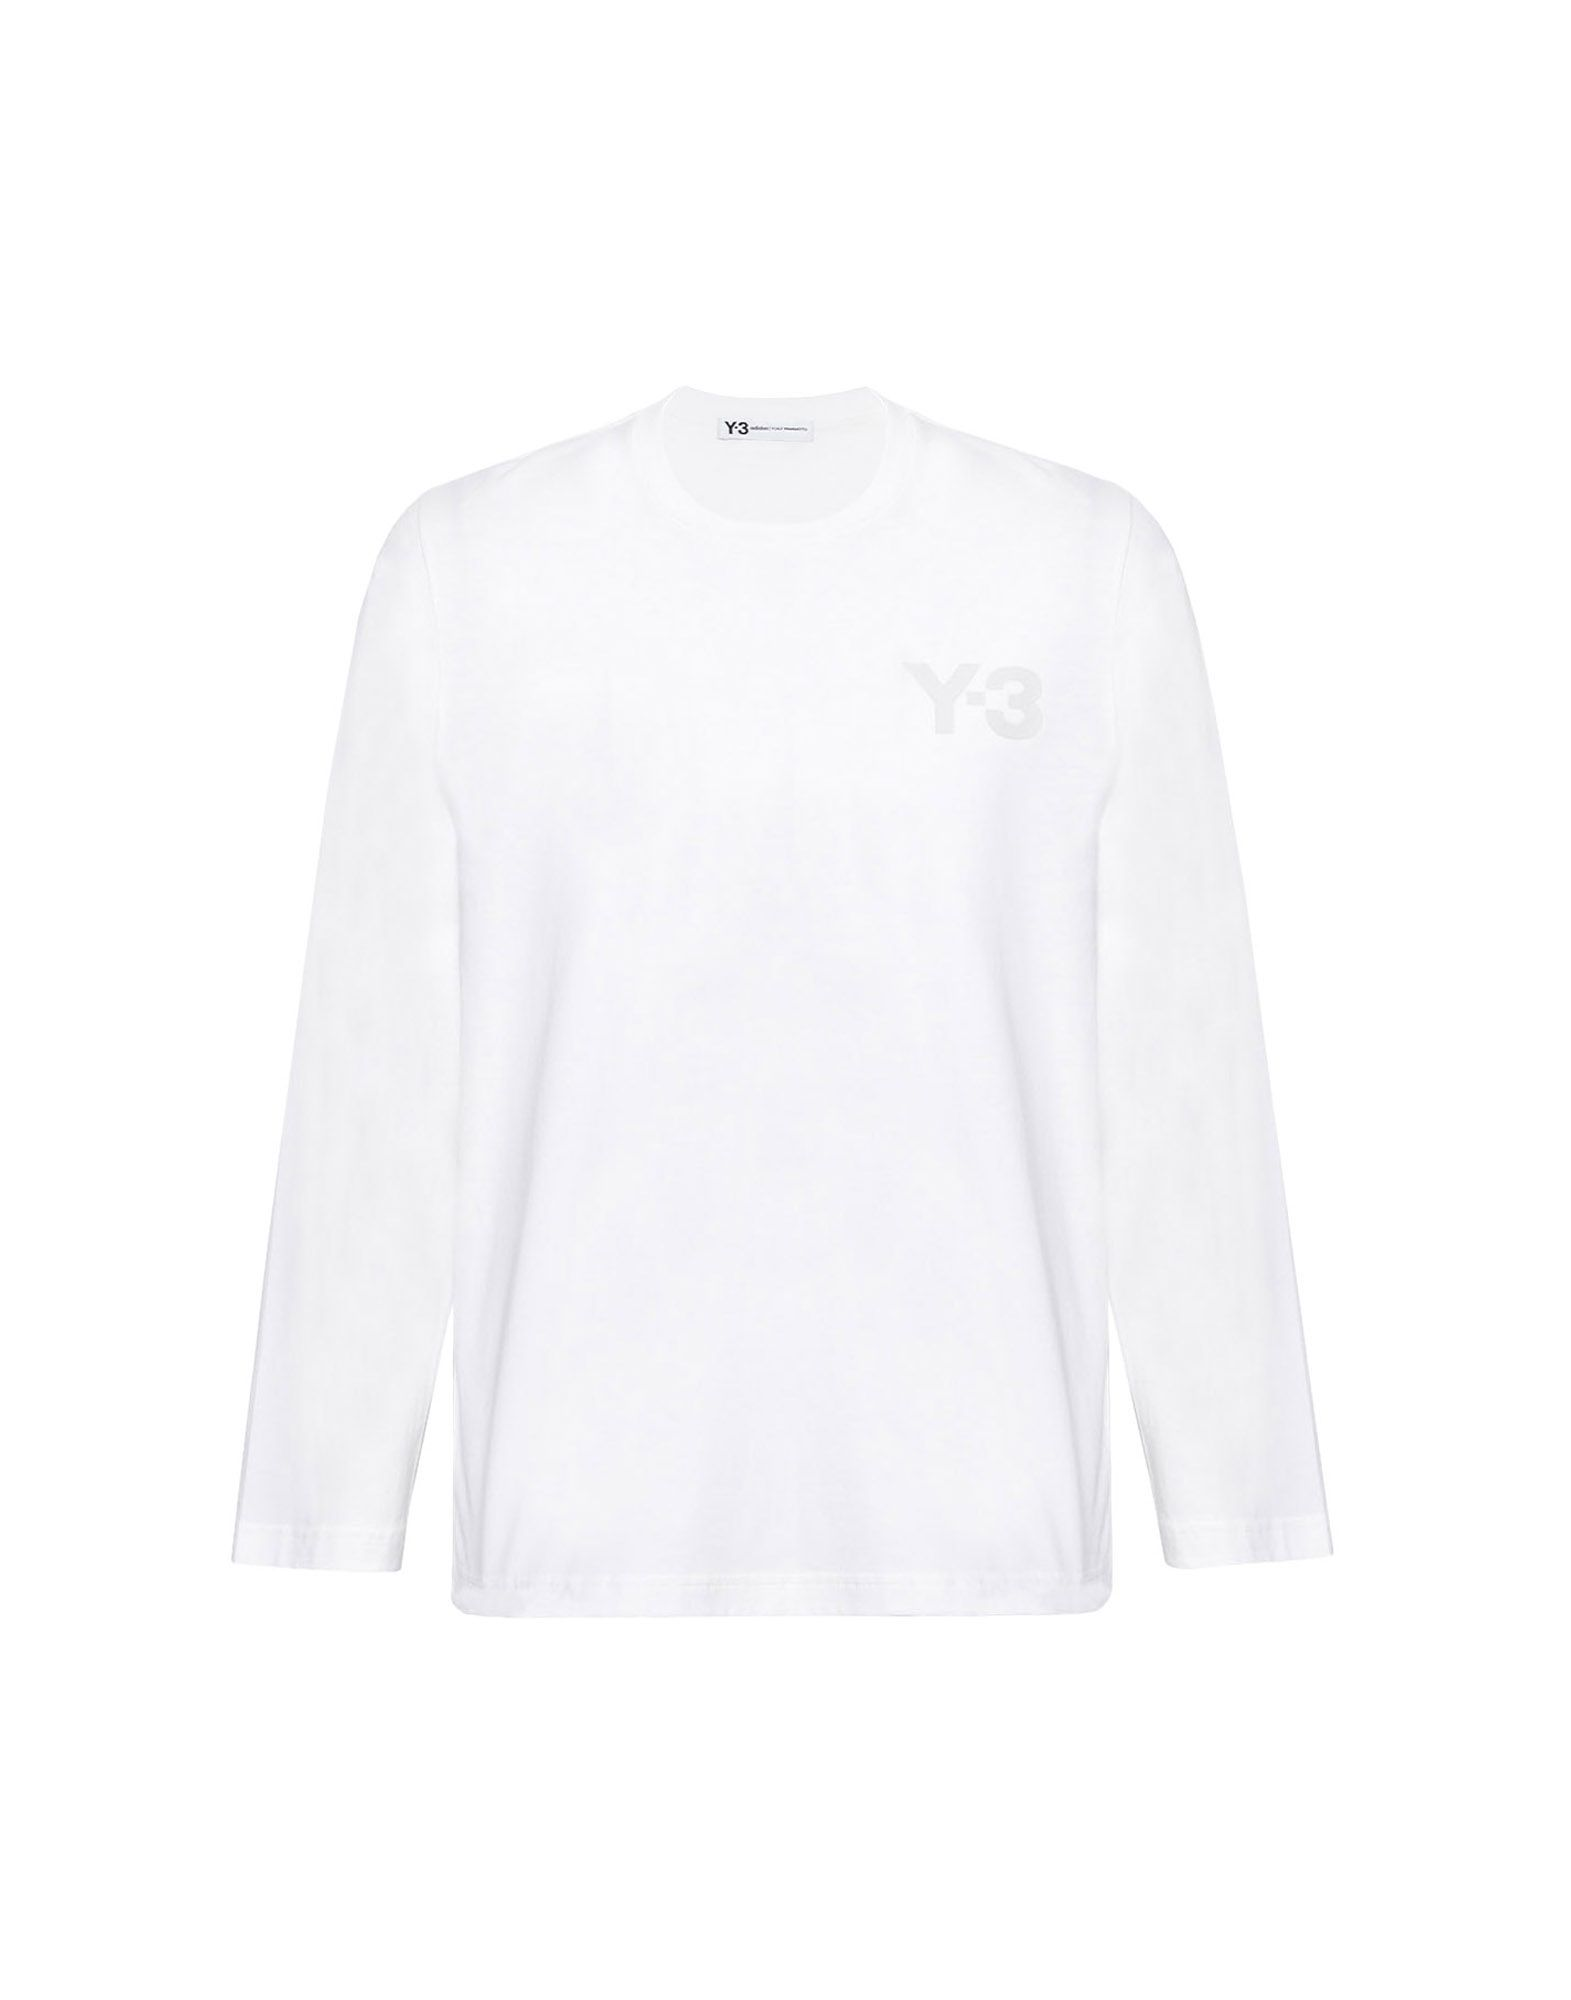 Y-3 Y-3 Classic Tee Long sleeve t-shirt Man f